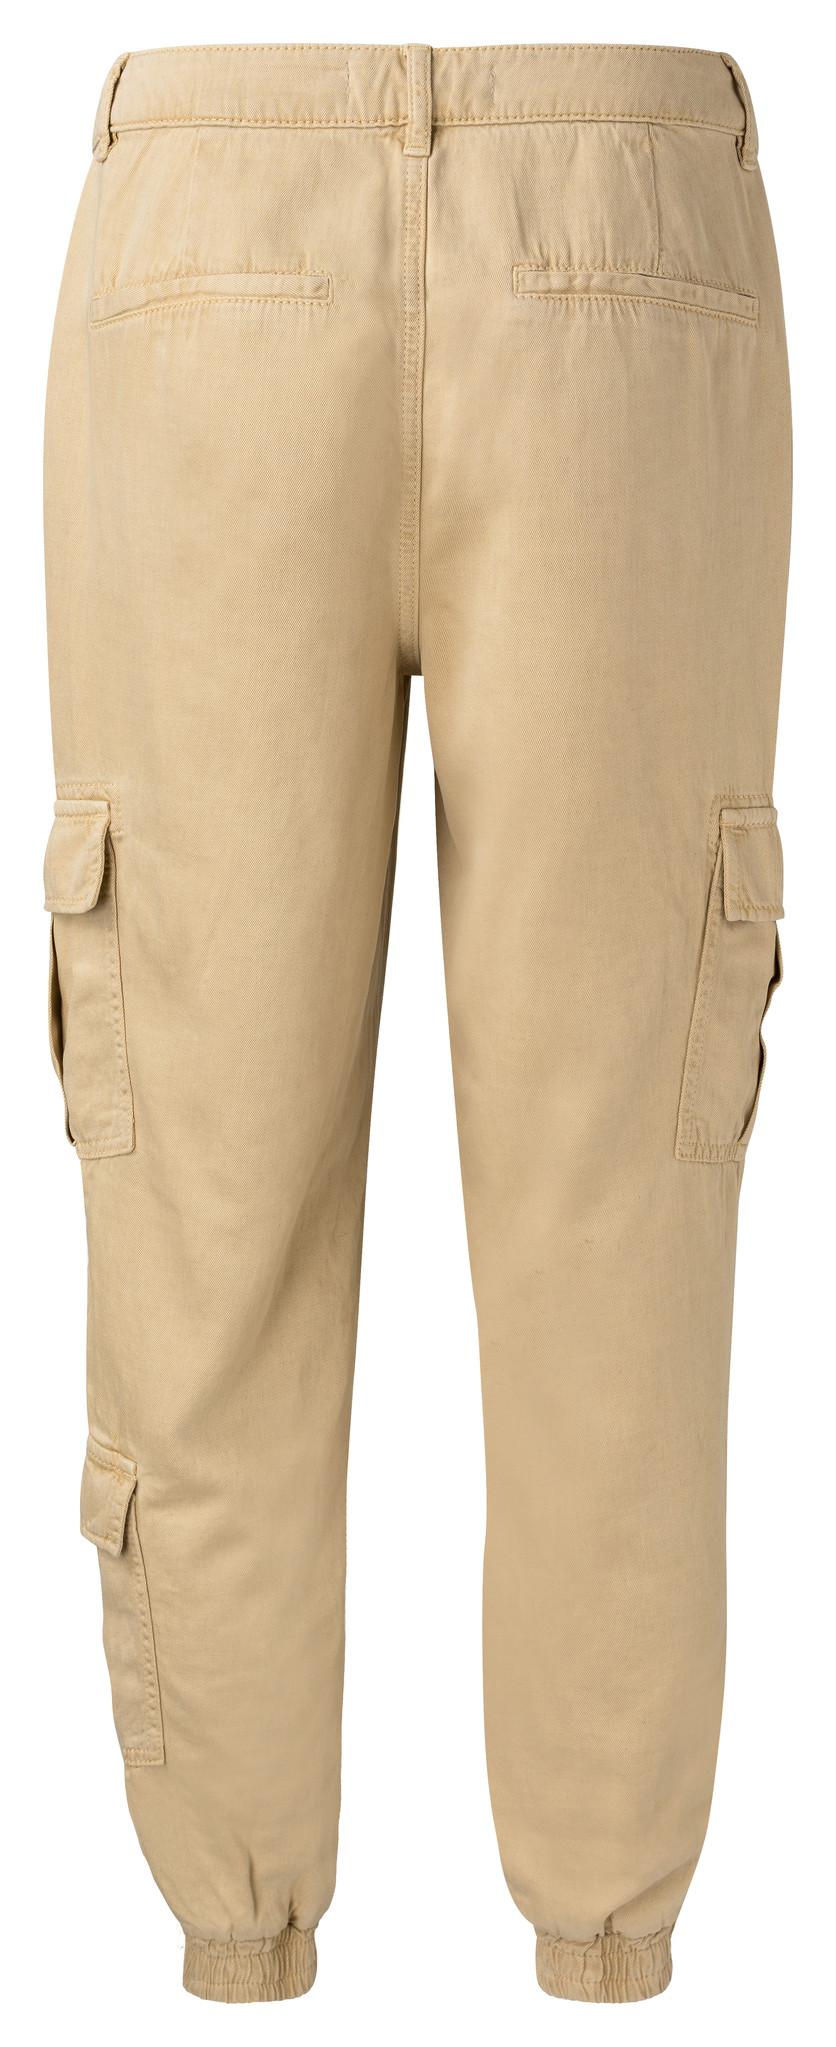 yaya Cargo trousers with 1201147-115-3